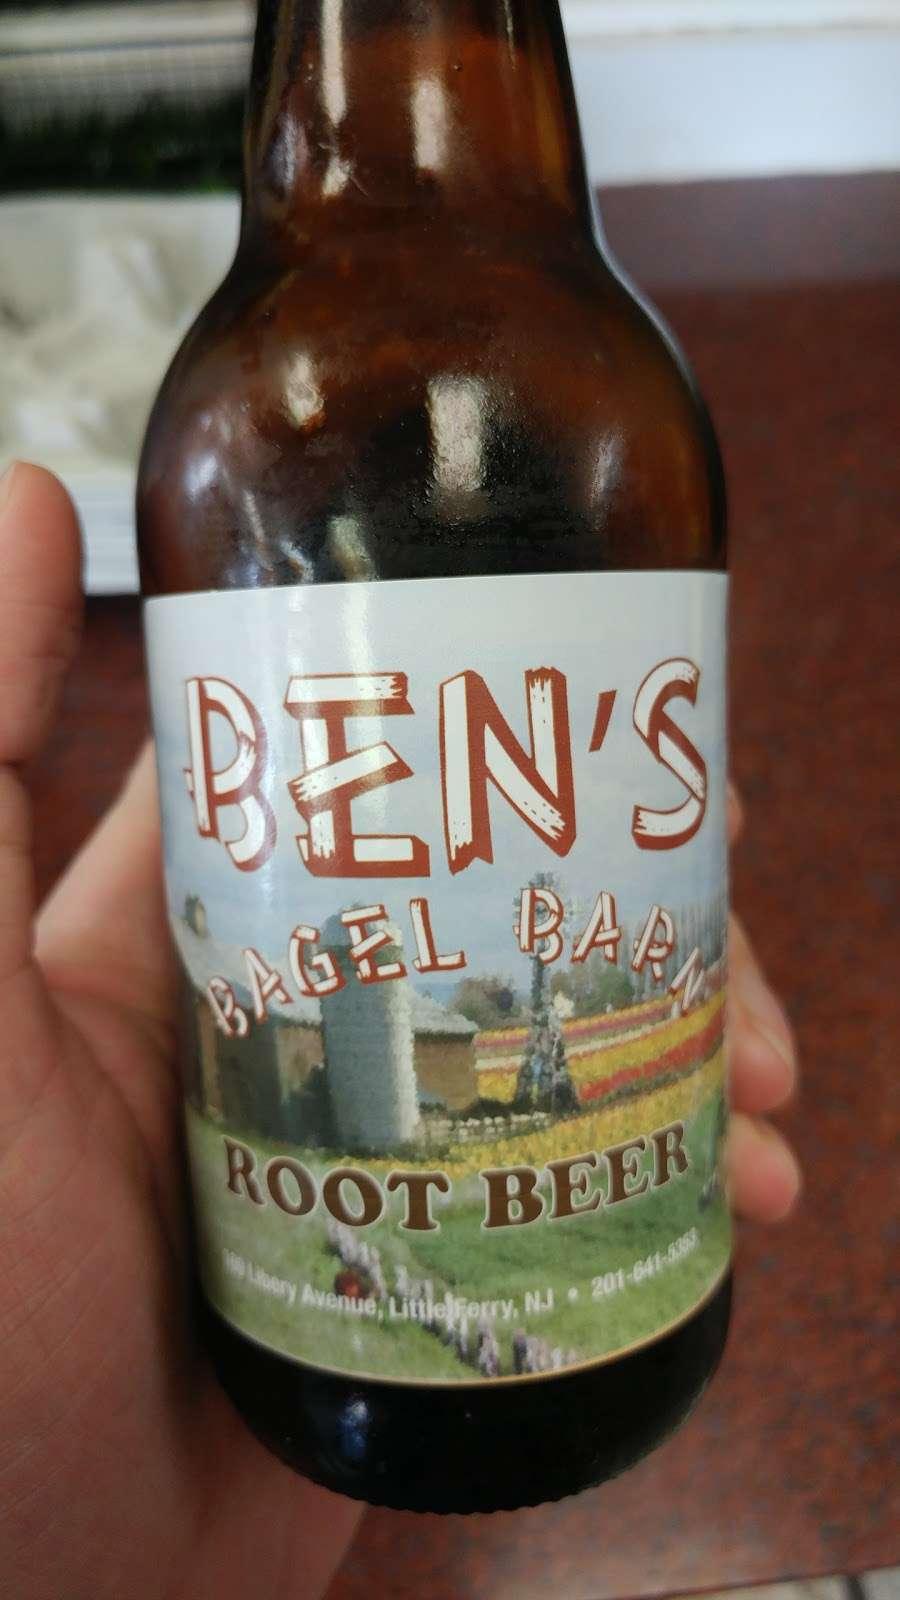 Bens Bagel Barn - bakery  | Photo 7 of 10 | Address: 169 Liberty St, Little Ferry, NJ 07643, USA | Phone: (201) 641-5353